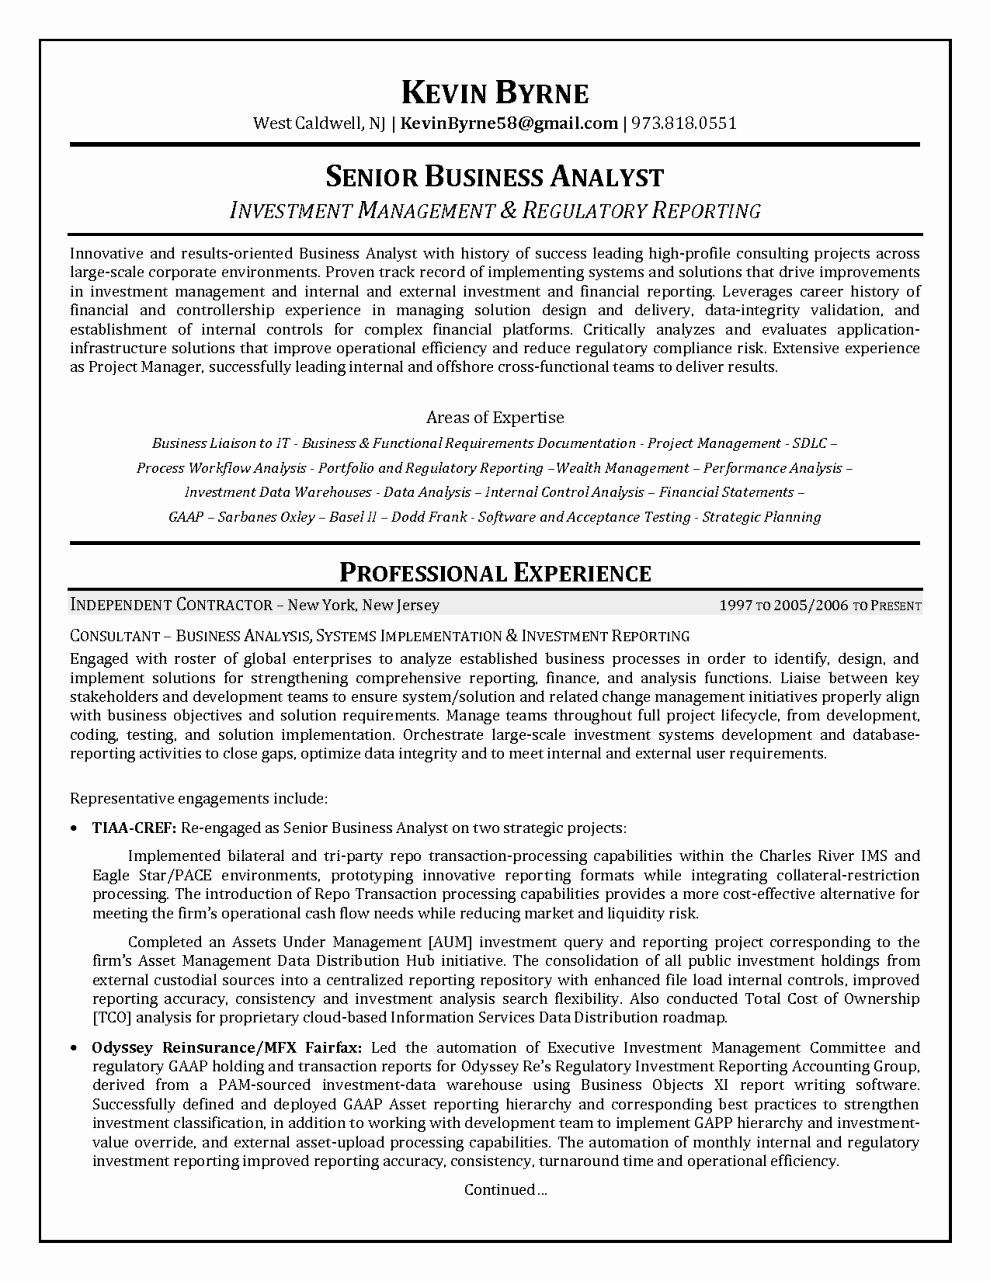 Sample Business Analyst Resume Elegant Create Your Astonishing Business Analyst Resume And Gain Business Analyst Business Analyst Resume Analyst